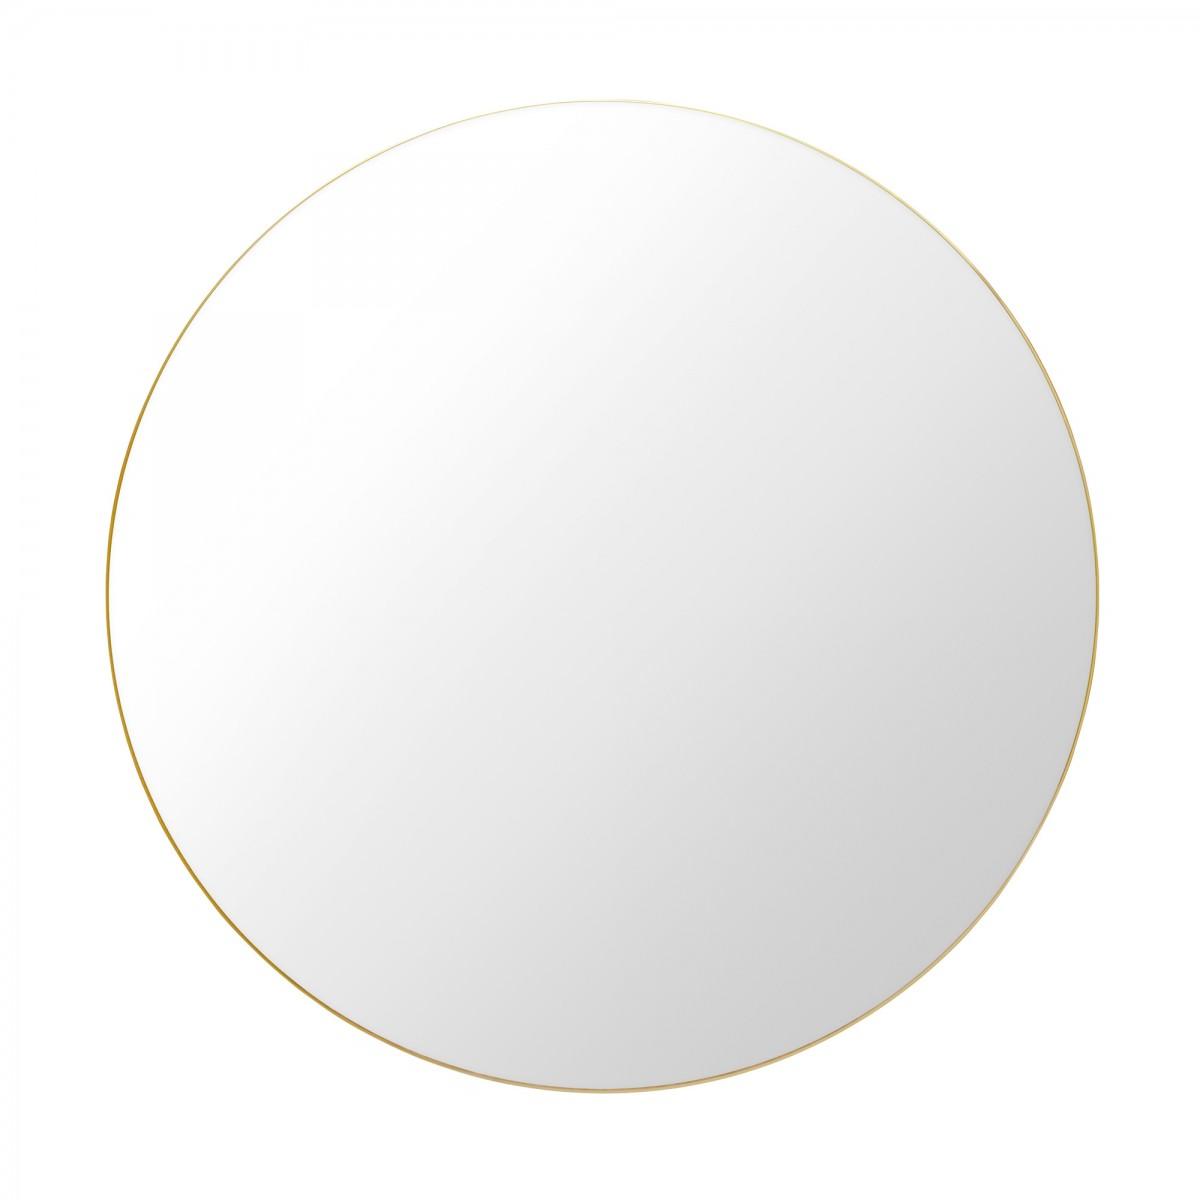 Miroir Rond O110 Cm Laiton Gubi